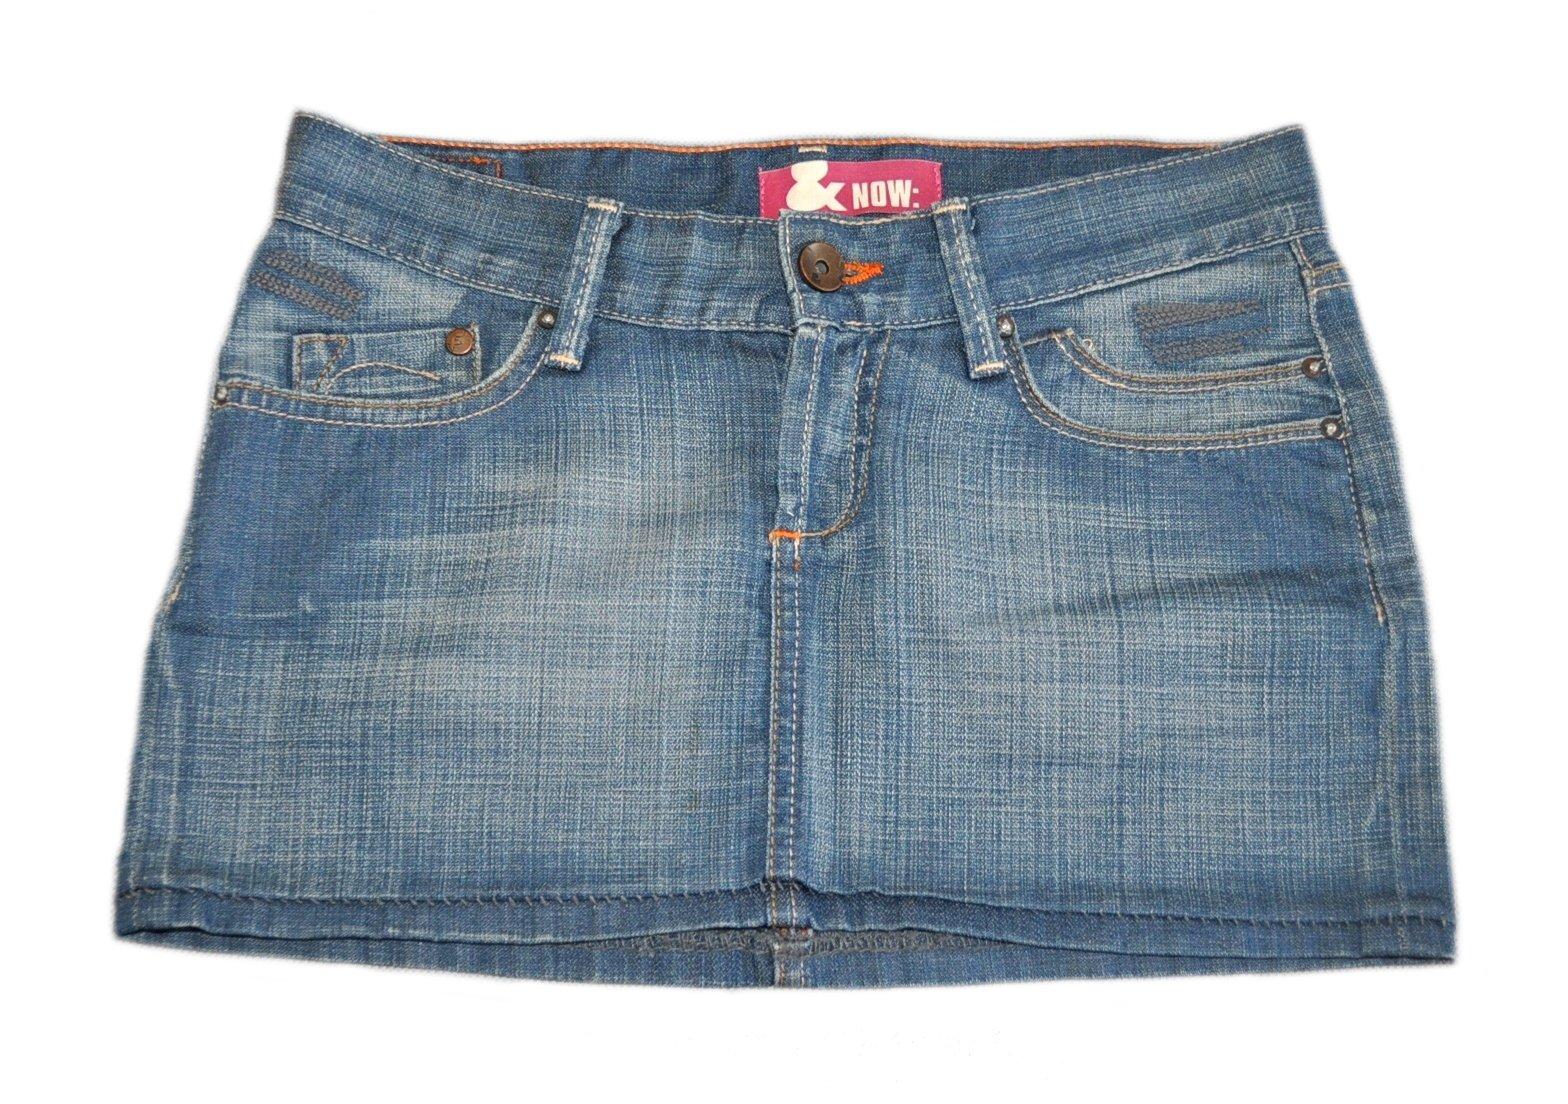 d90fa8f08c Spódnica H M jeansowa r. 34 XS jeans ideał - 7123542970 - oficjalne ...